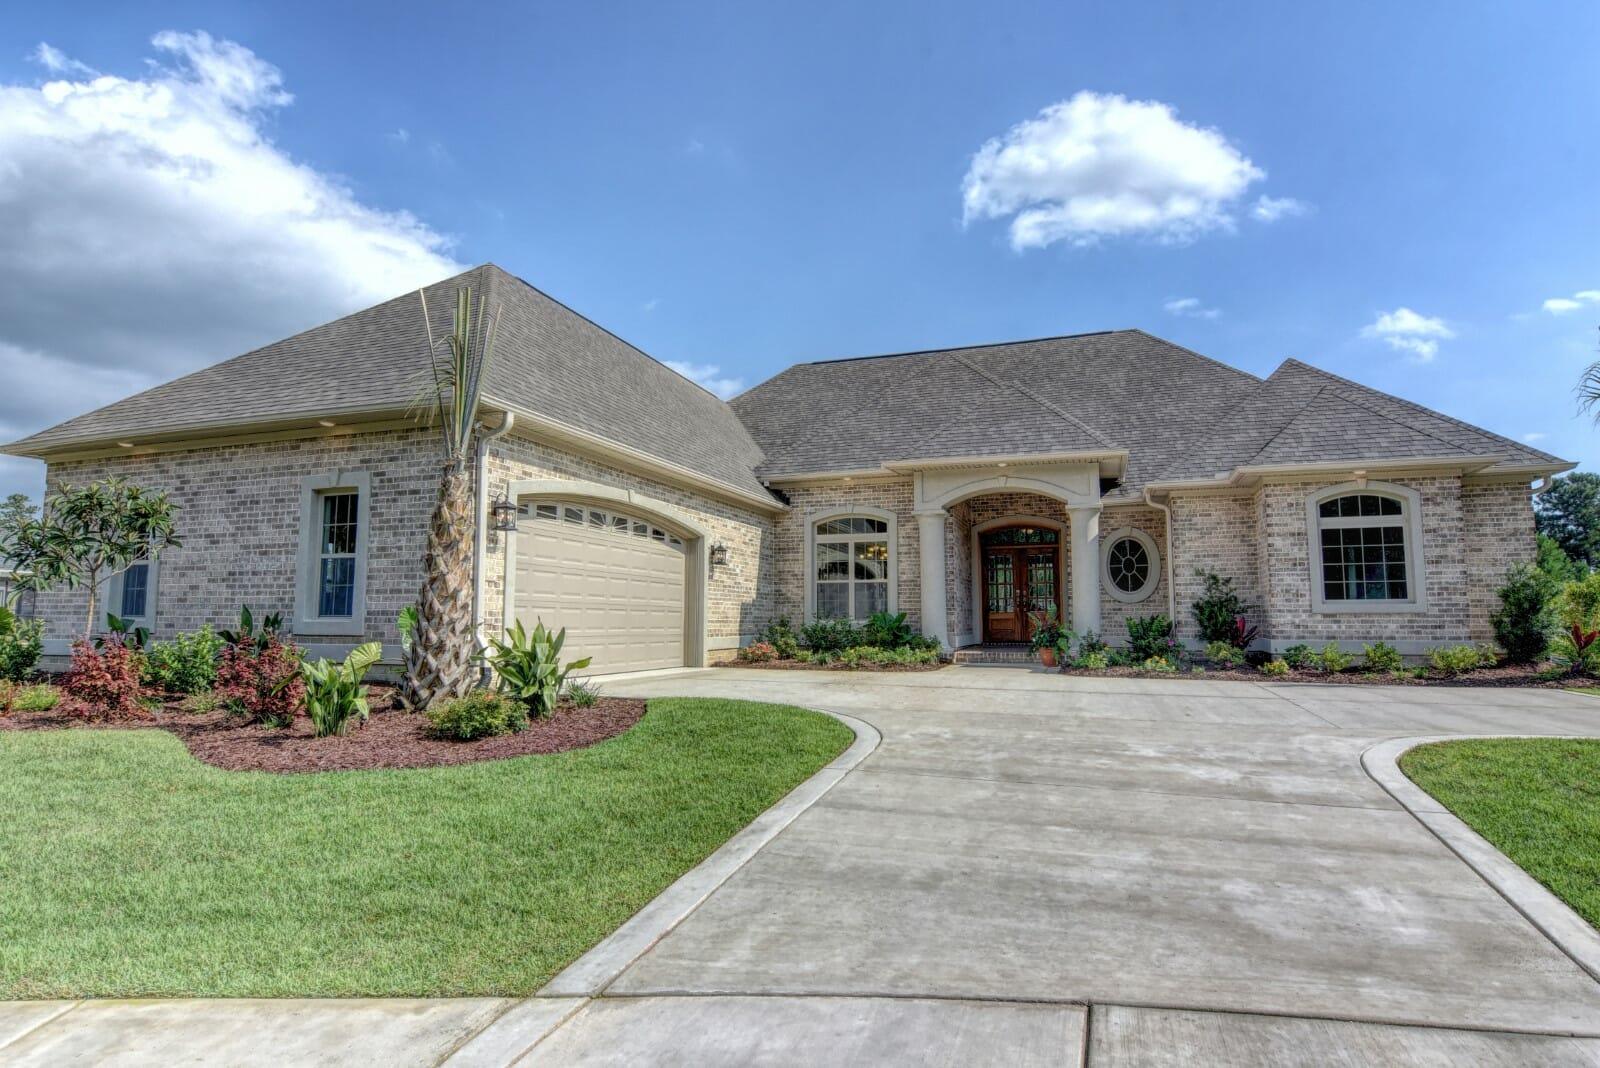 Logan Homes | Home Builders in North Carolina | Top Coastal NC | Logan Homes | Home Builders in South Carolina | Coastal SC